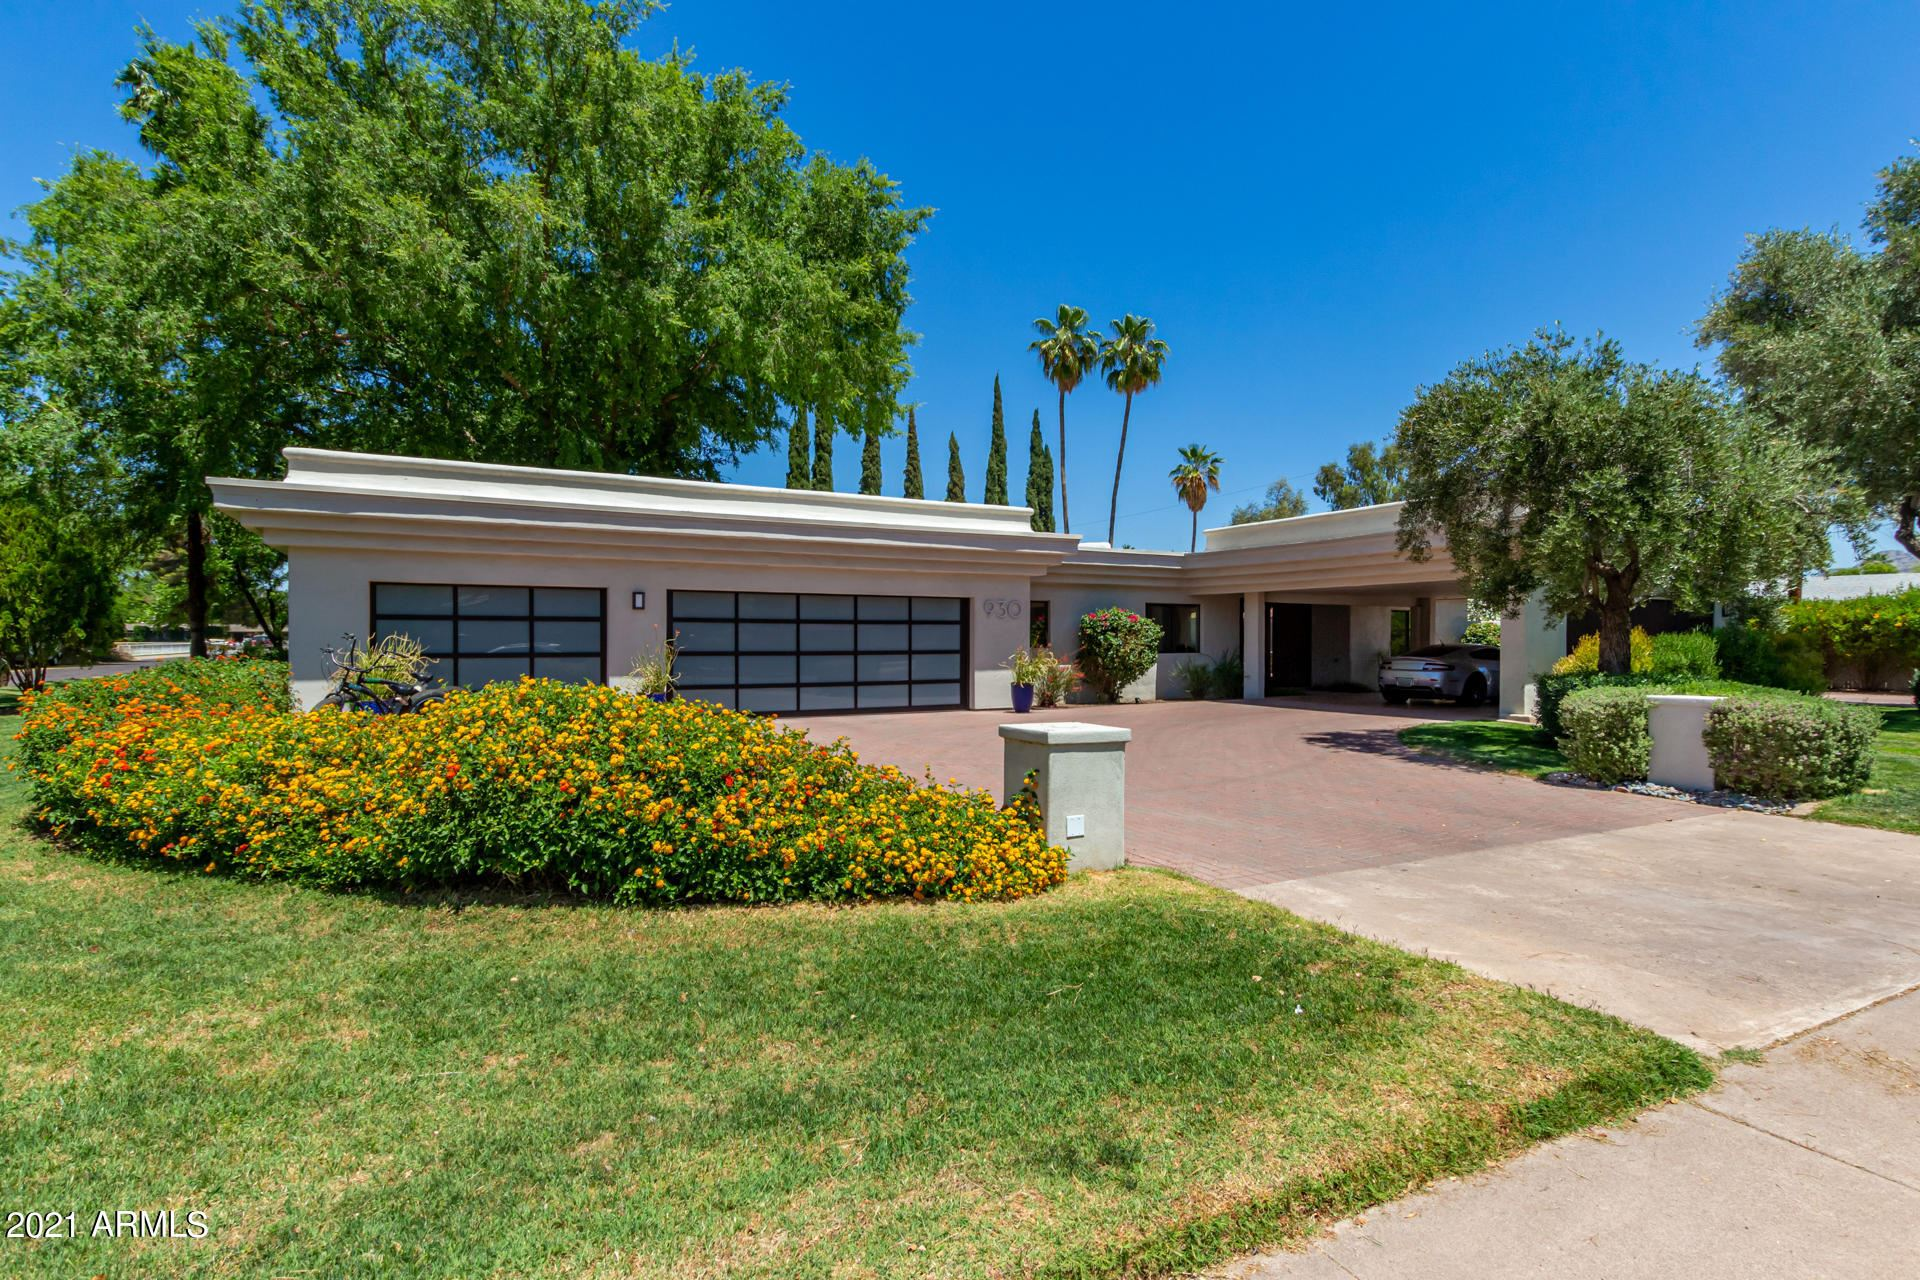 930 W MARYLAND Avenue, Phoenix, AZ 85013 - MLS#: 6234835